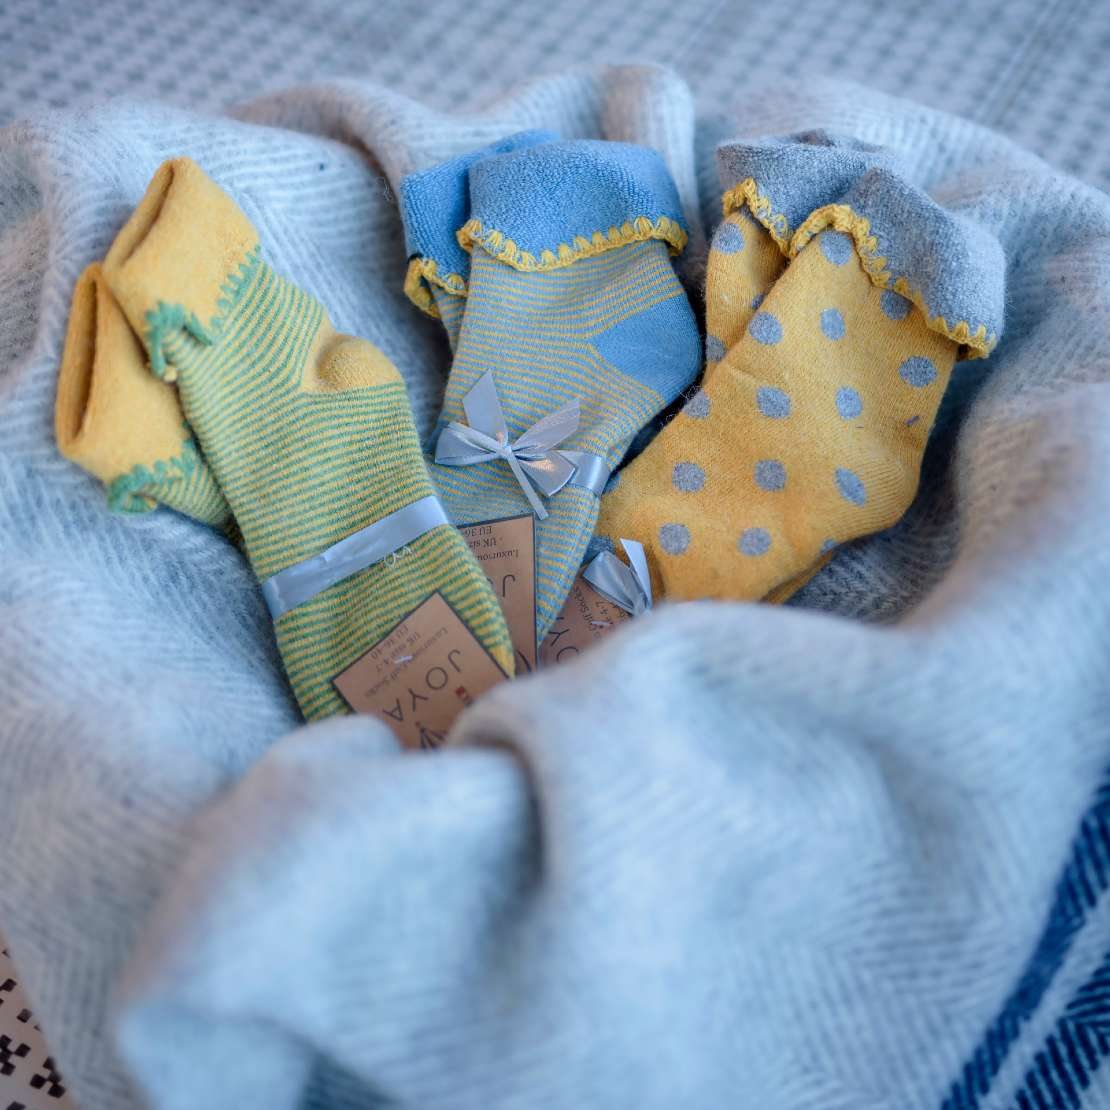 The 10 Top Sale Picks - Joya Socks